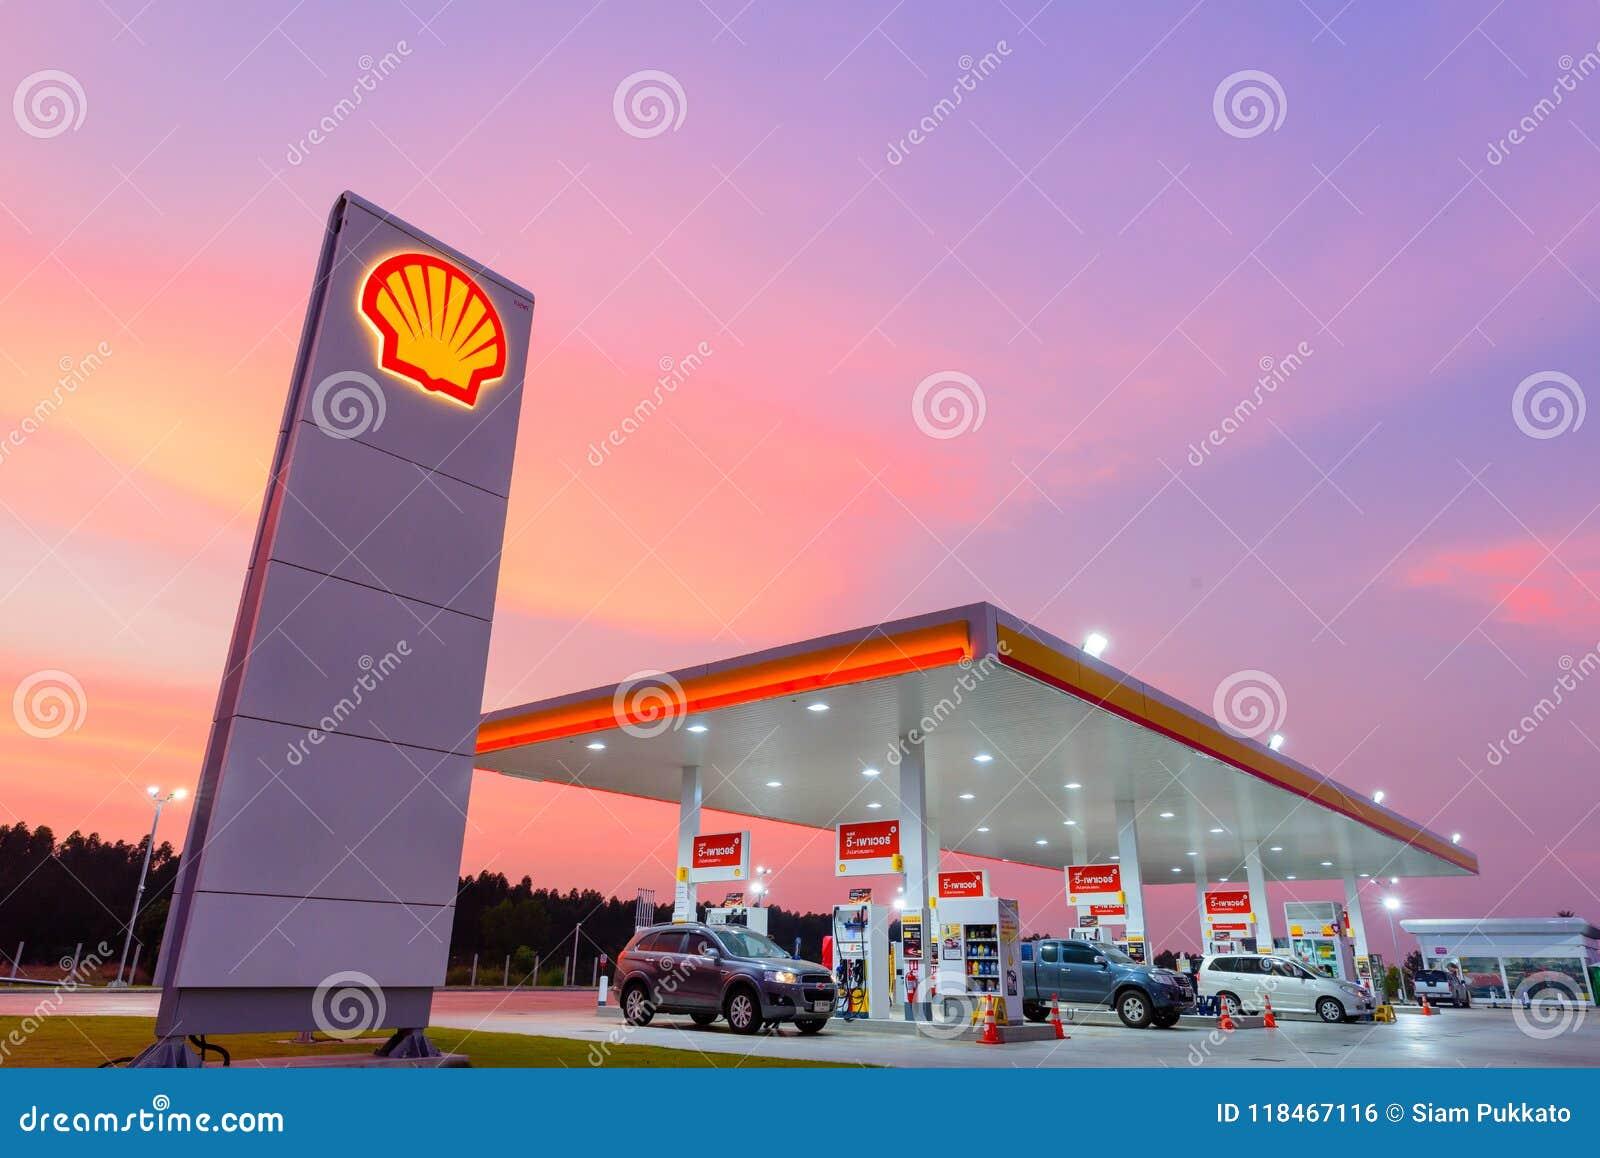 Chachoengsao, Thailand - Jan 28, 2018: Shell gas station.